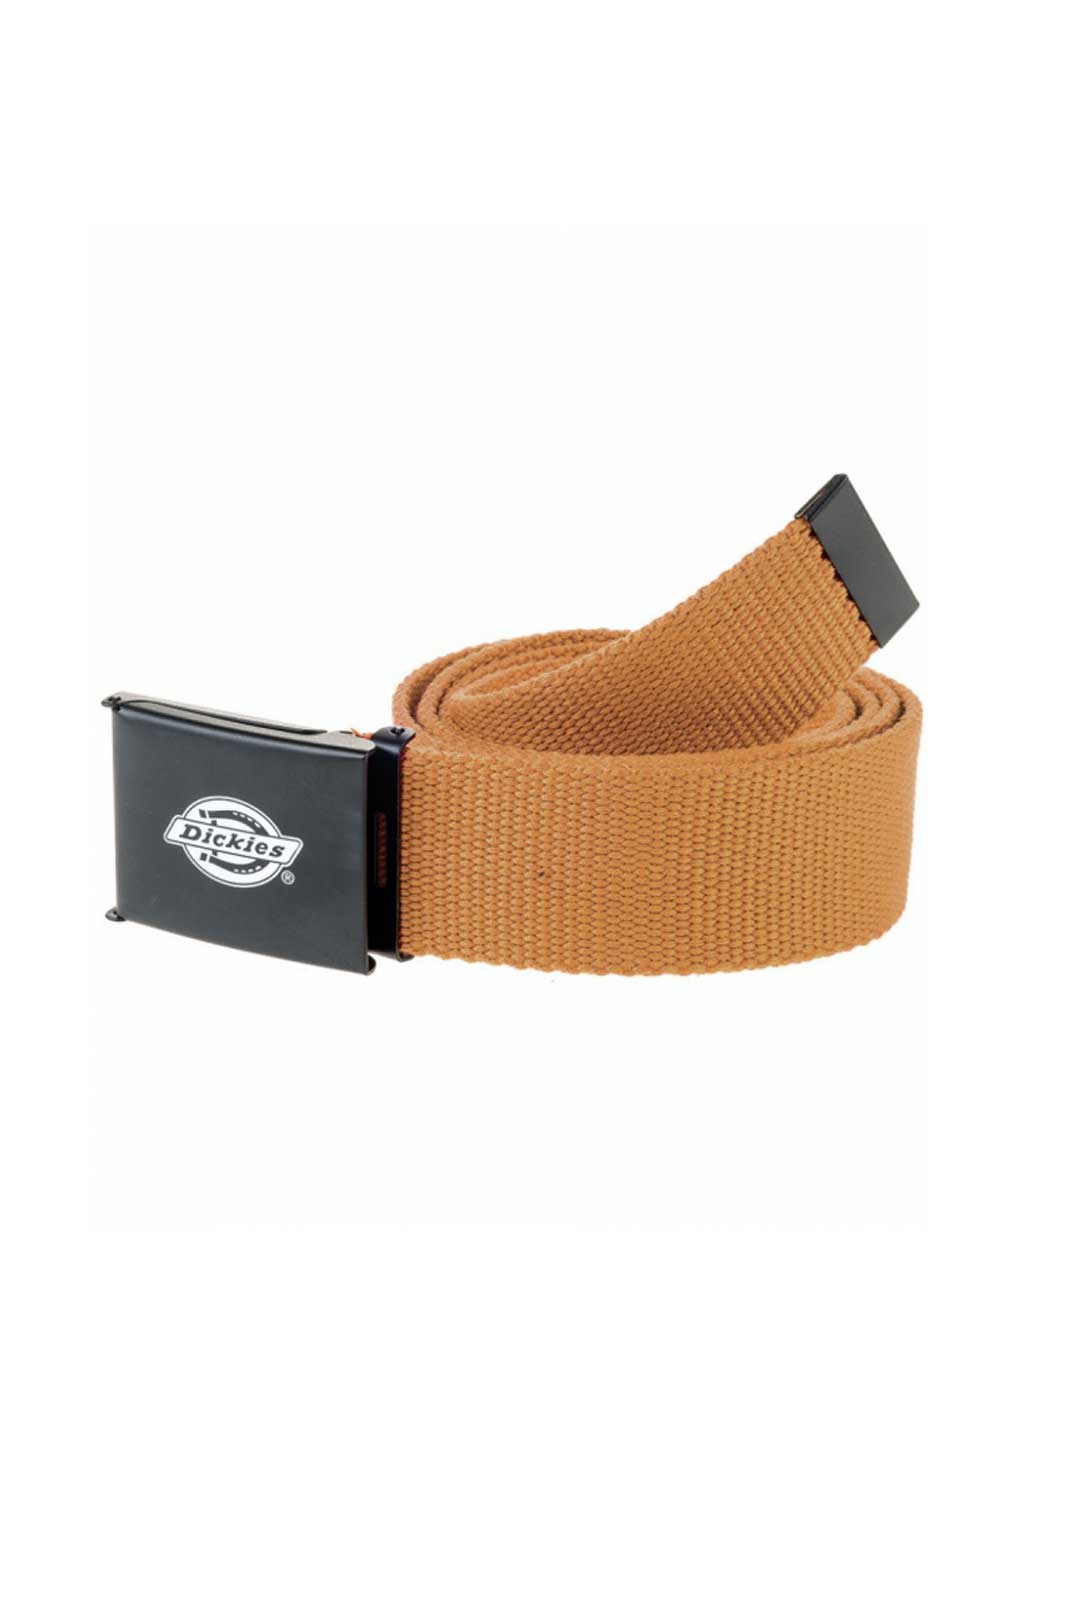 dickies-orcutt-brown-duck-belt